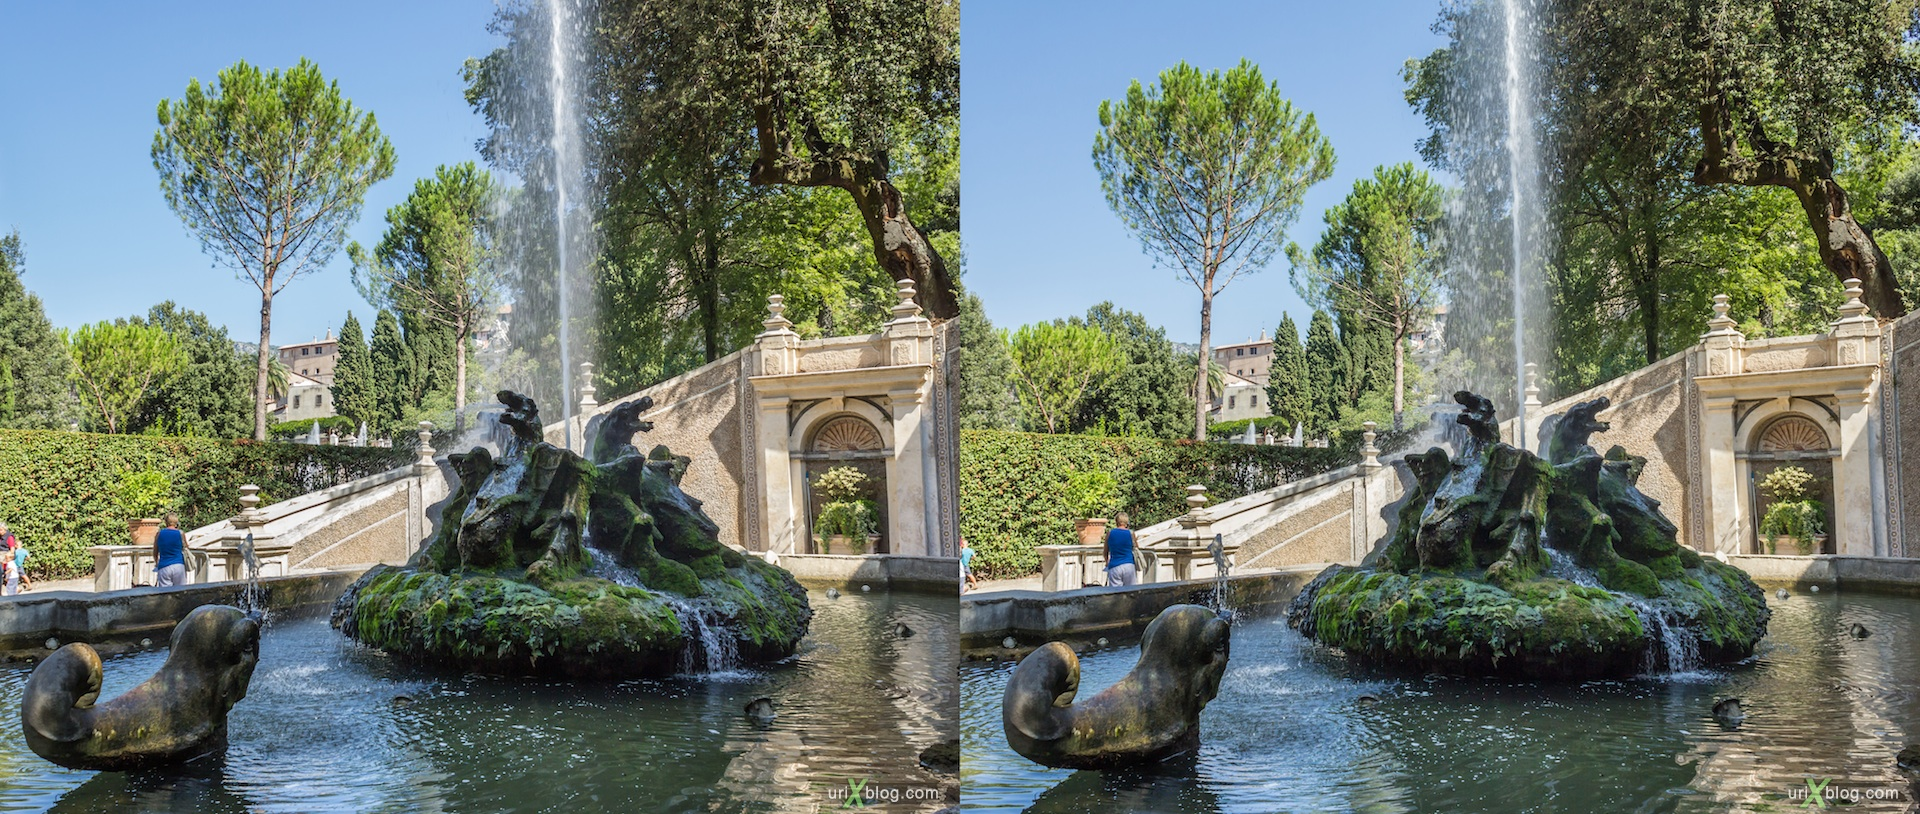 2012, Fontana dei Draghi, villa D'Este, Italy, Tivoli, Rome, 3D, stereo pair, cross-eyed, crossview, cross view stereo pair